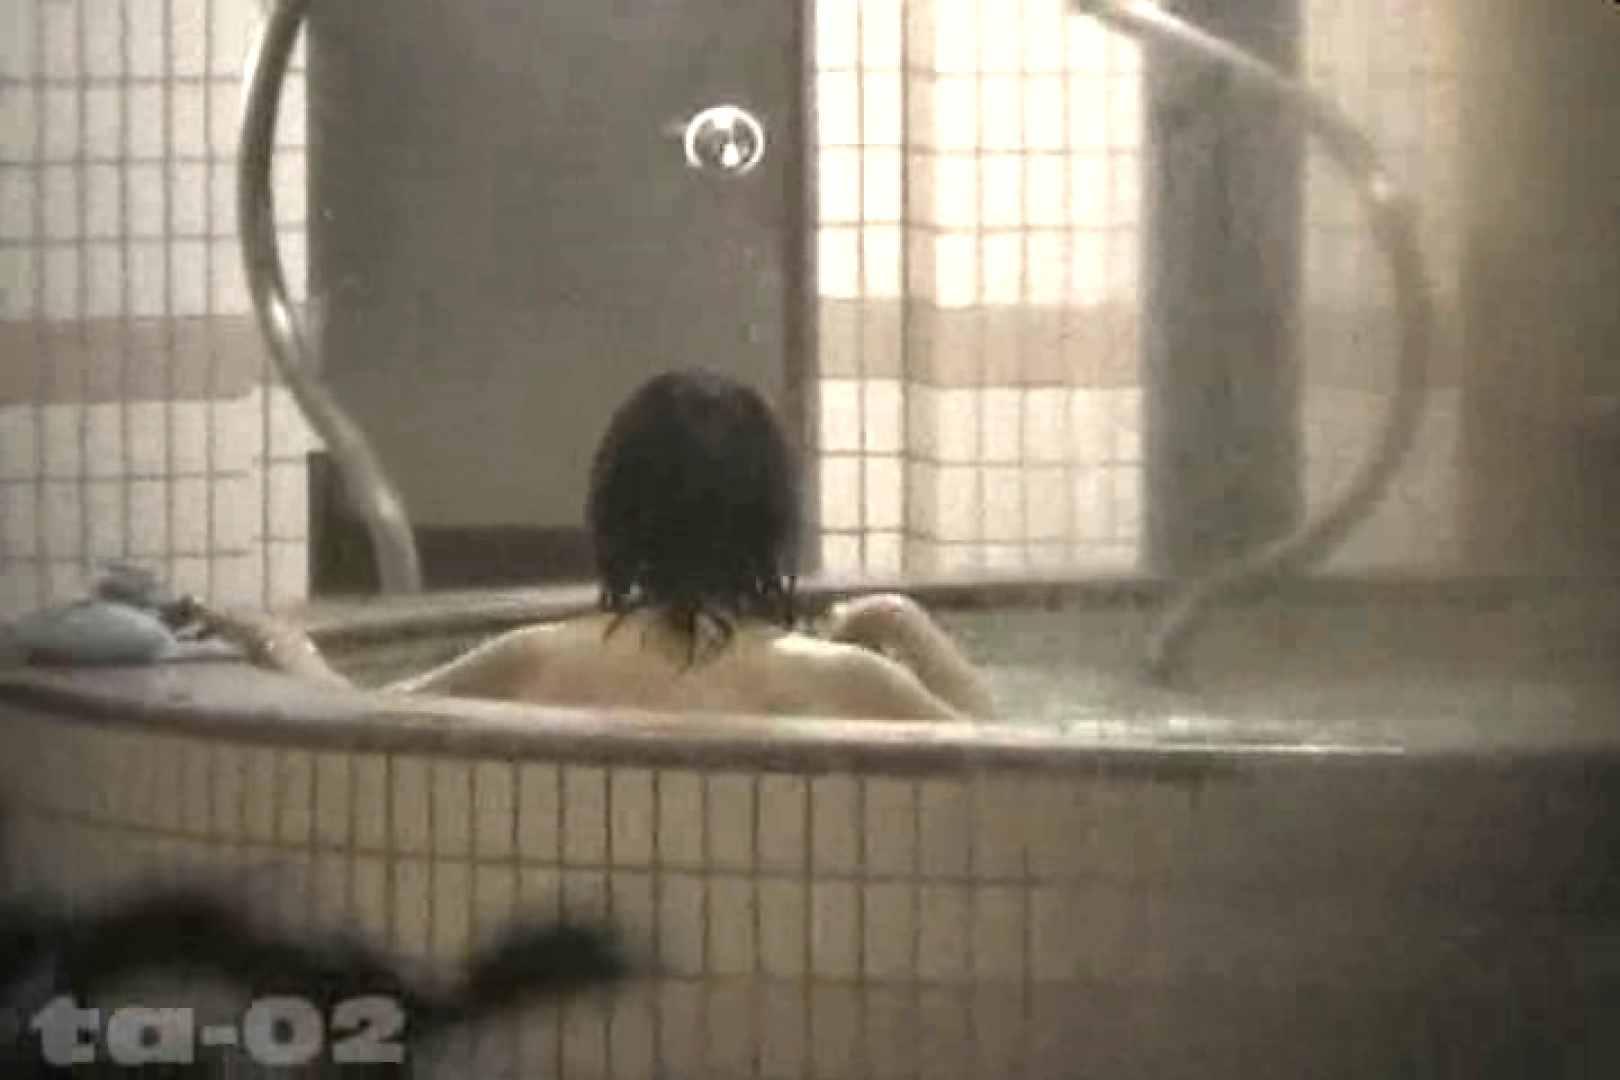 合宿ホテル女風呂盗撮高画質版 Vol.02 盗撮  81PIX 60